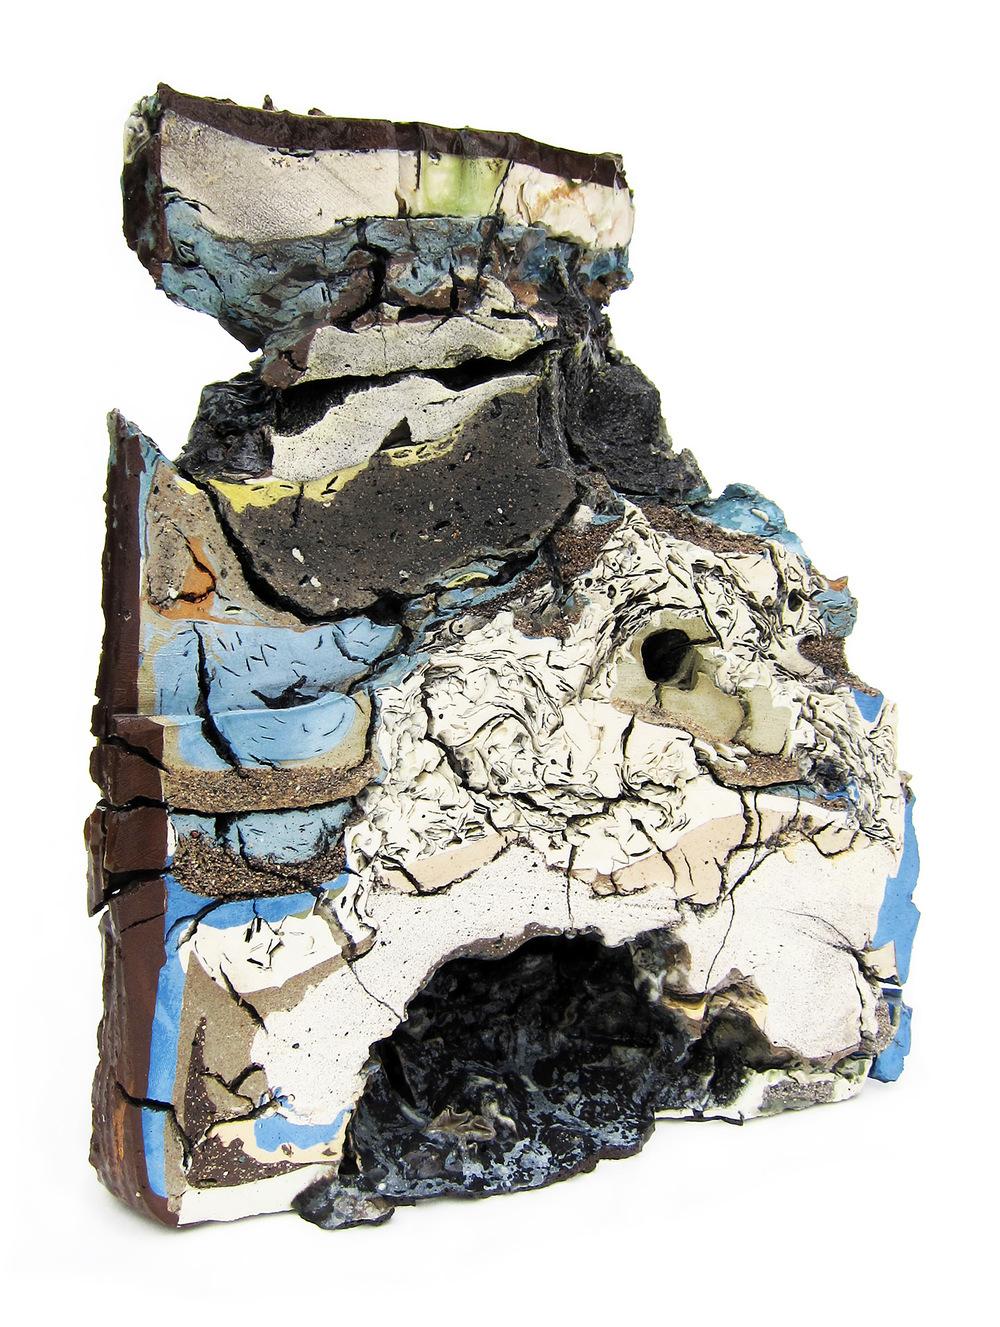 <em>Landfill No.9: Northeastern Cross Section</em>